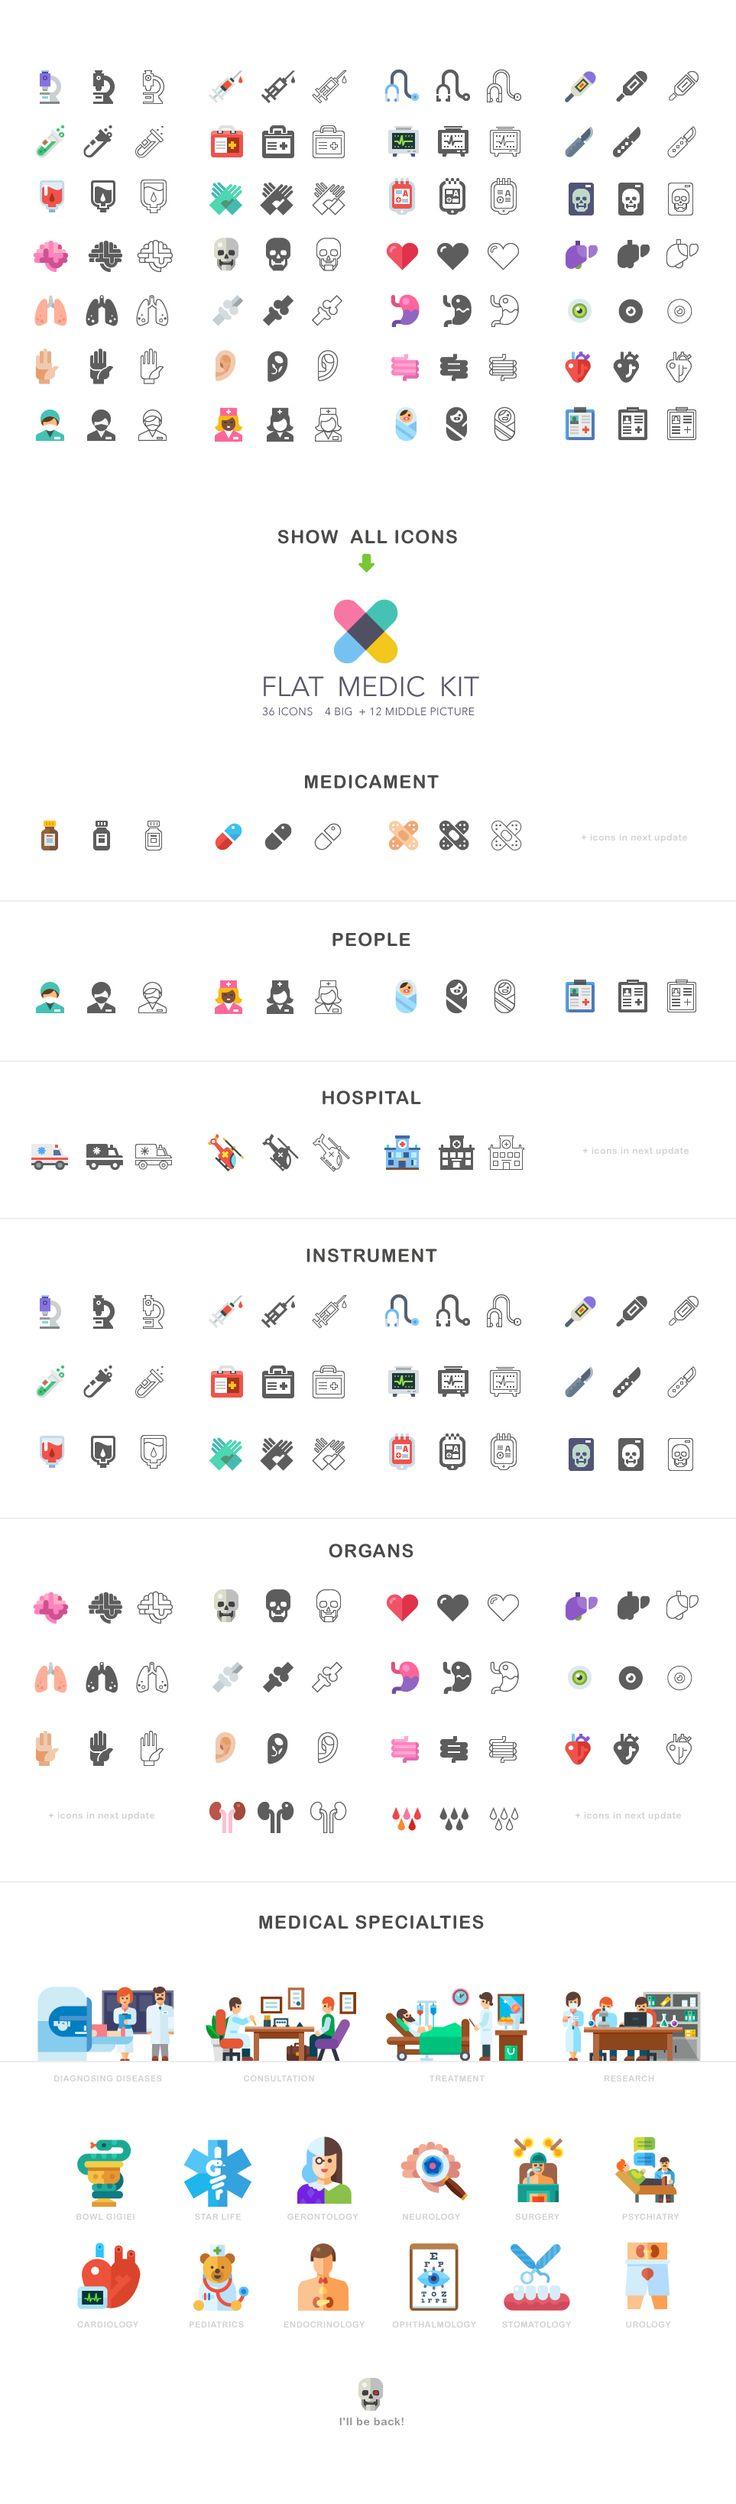 Flat medic icon and illustration kit on Behance